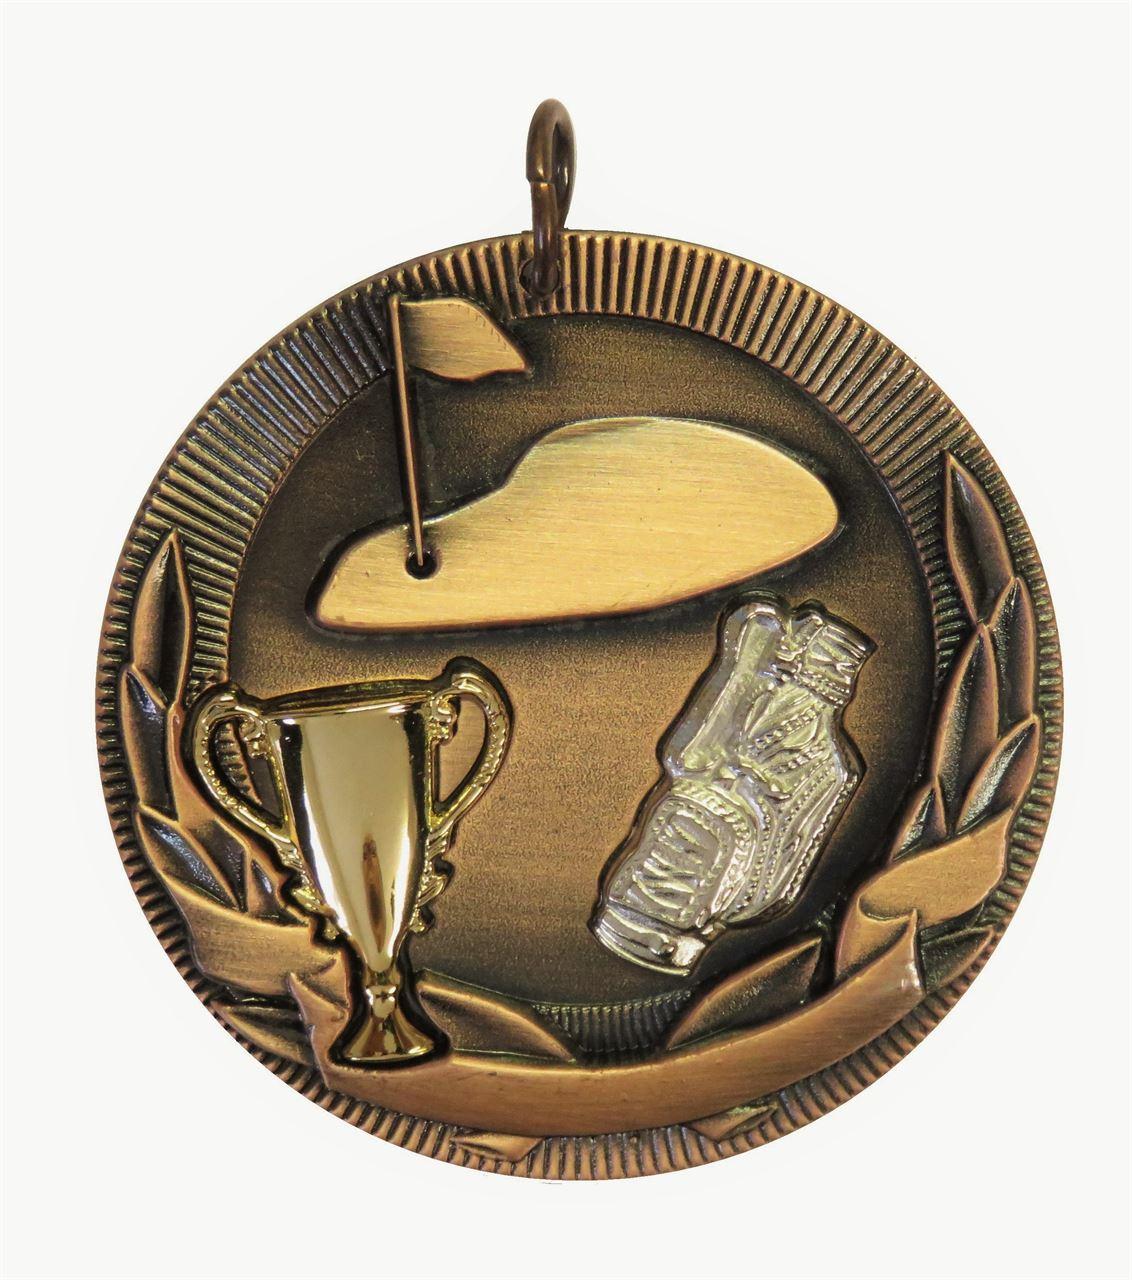 Copper Cup Design Golf Medal (size:50mm) - D3GF